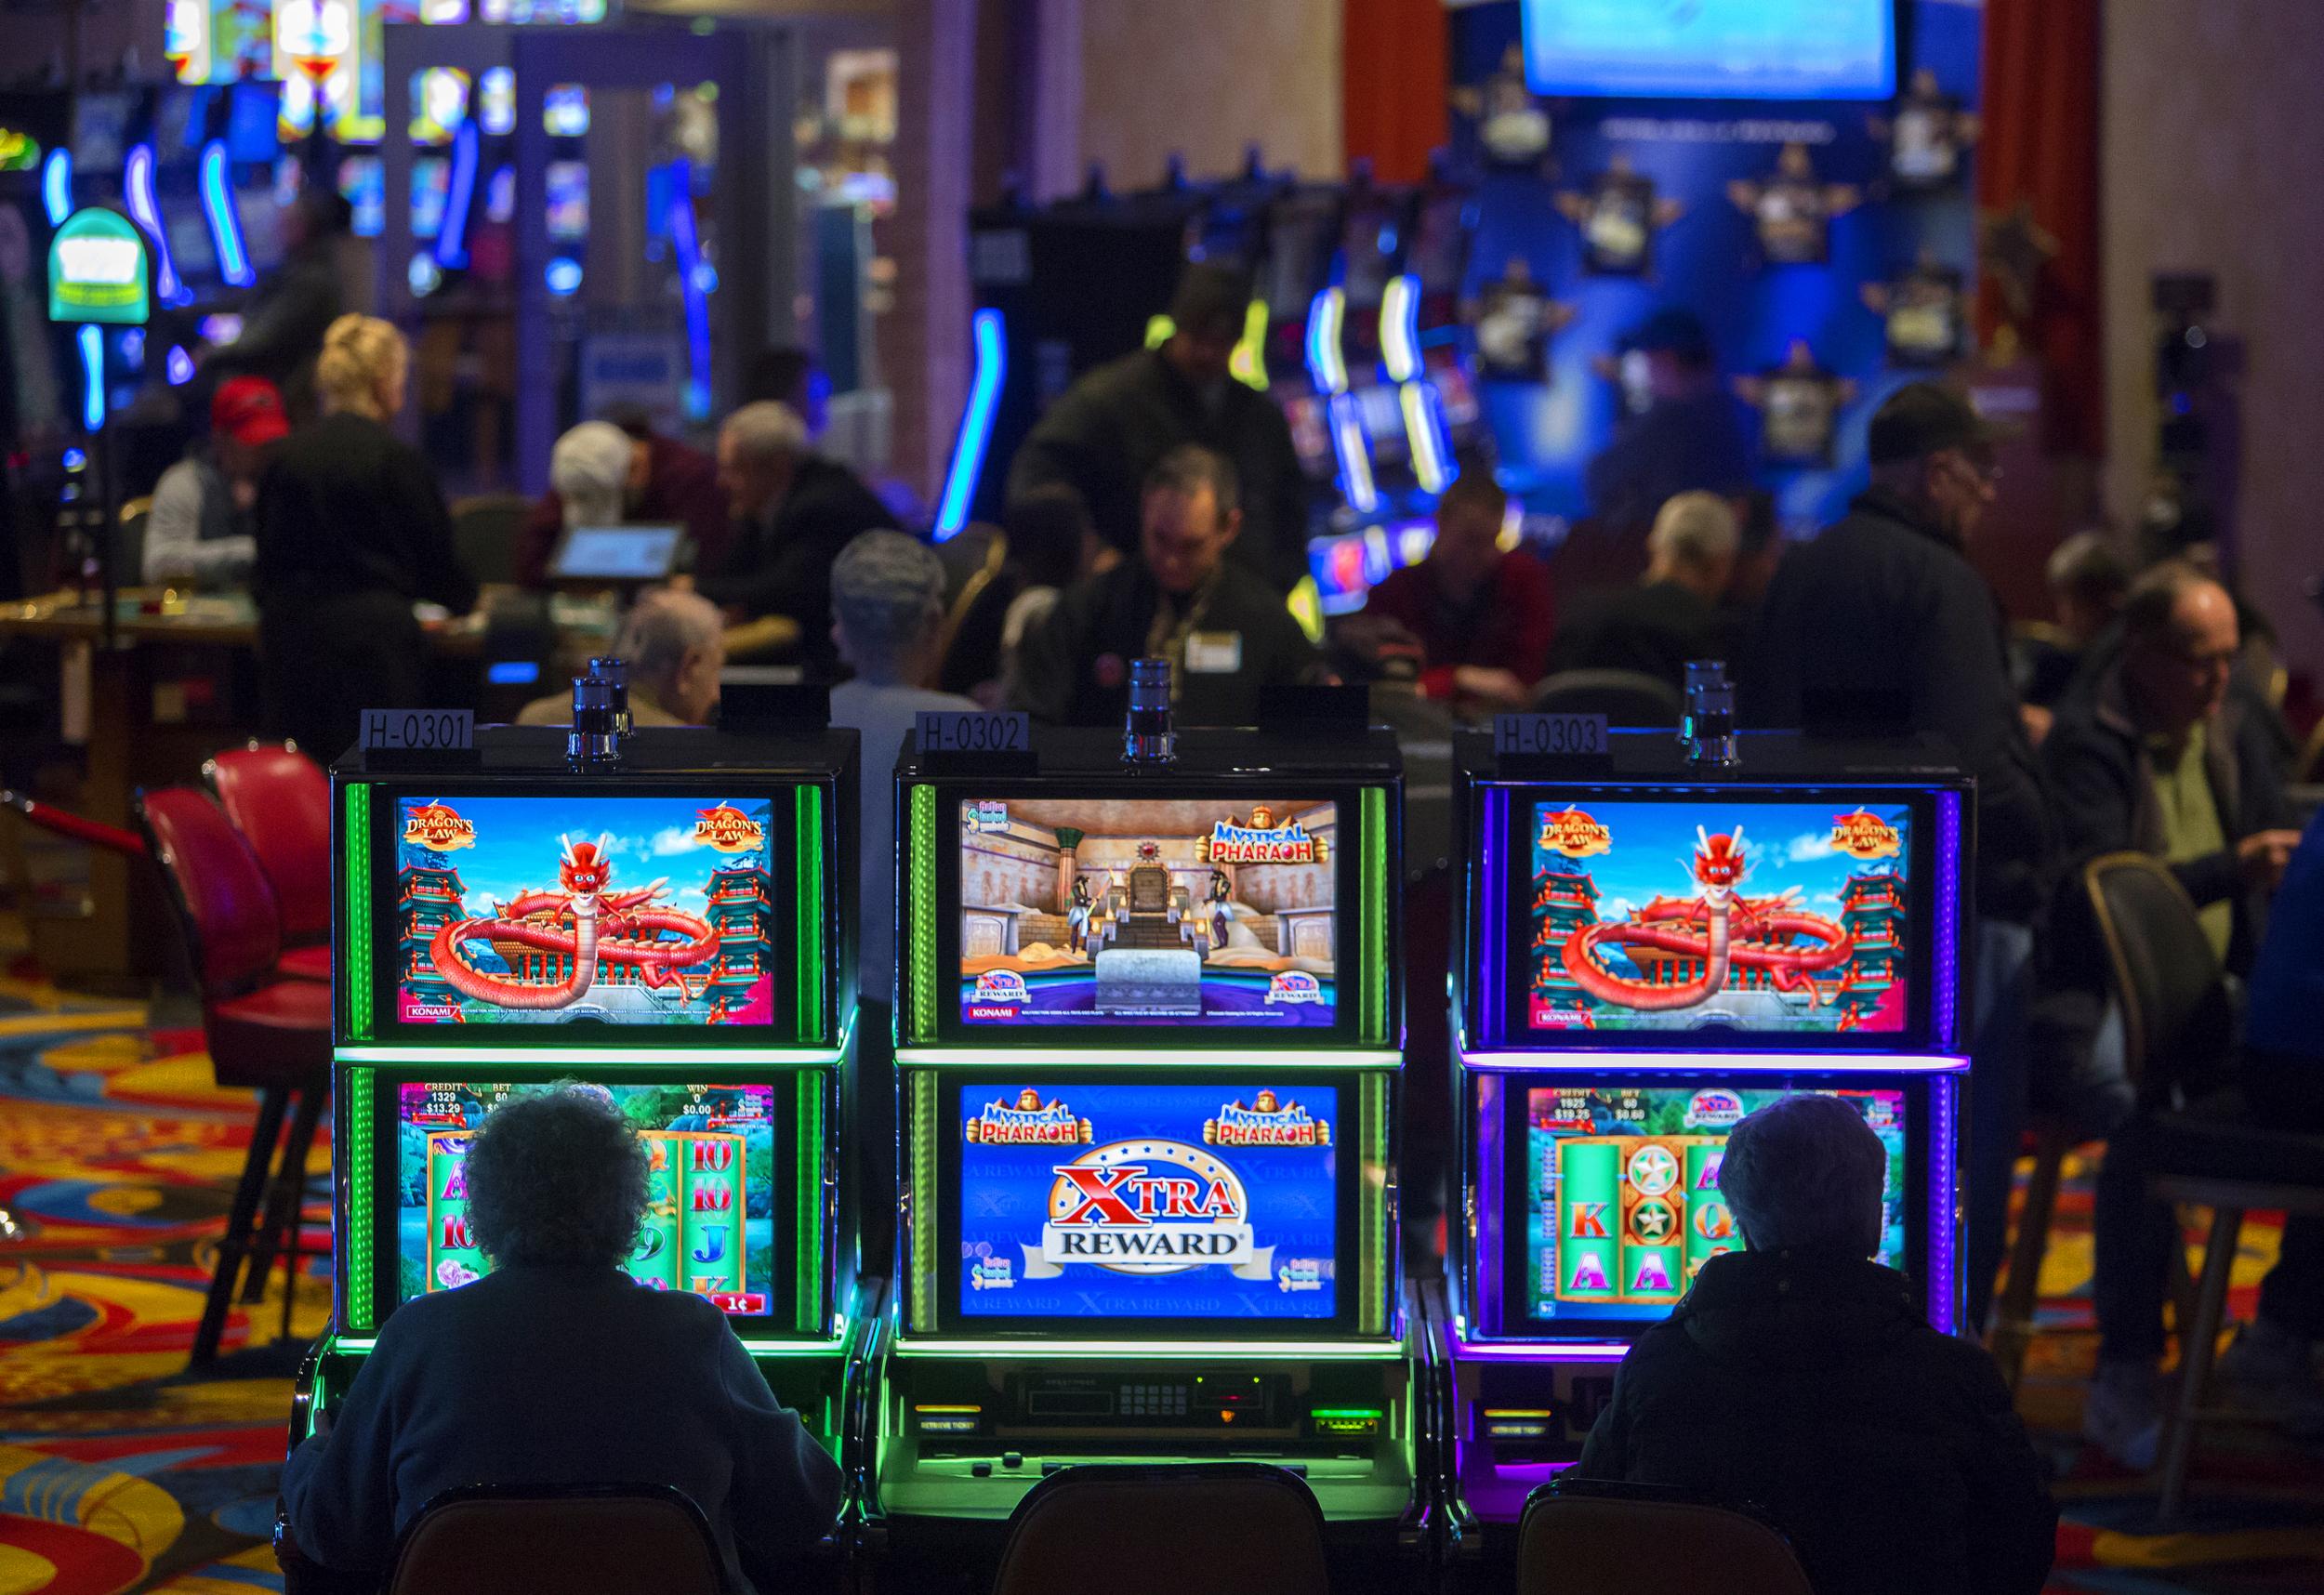 Hollywood casino oxford maine pico 2 game